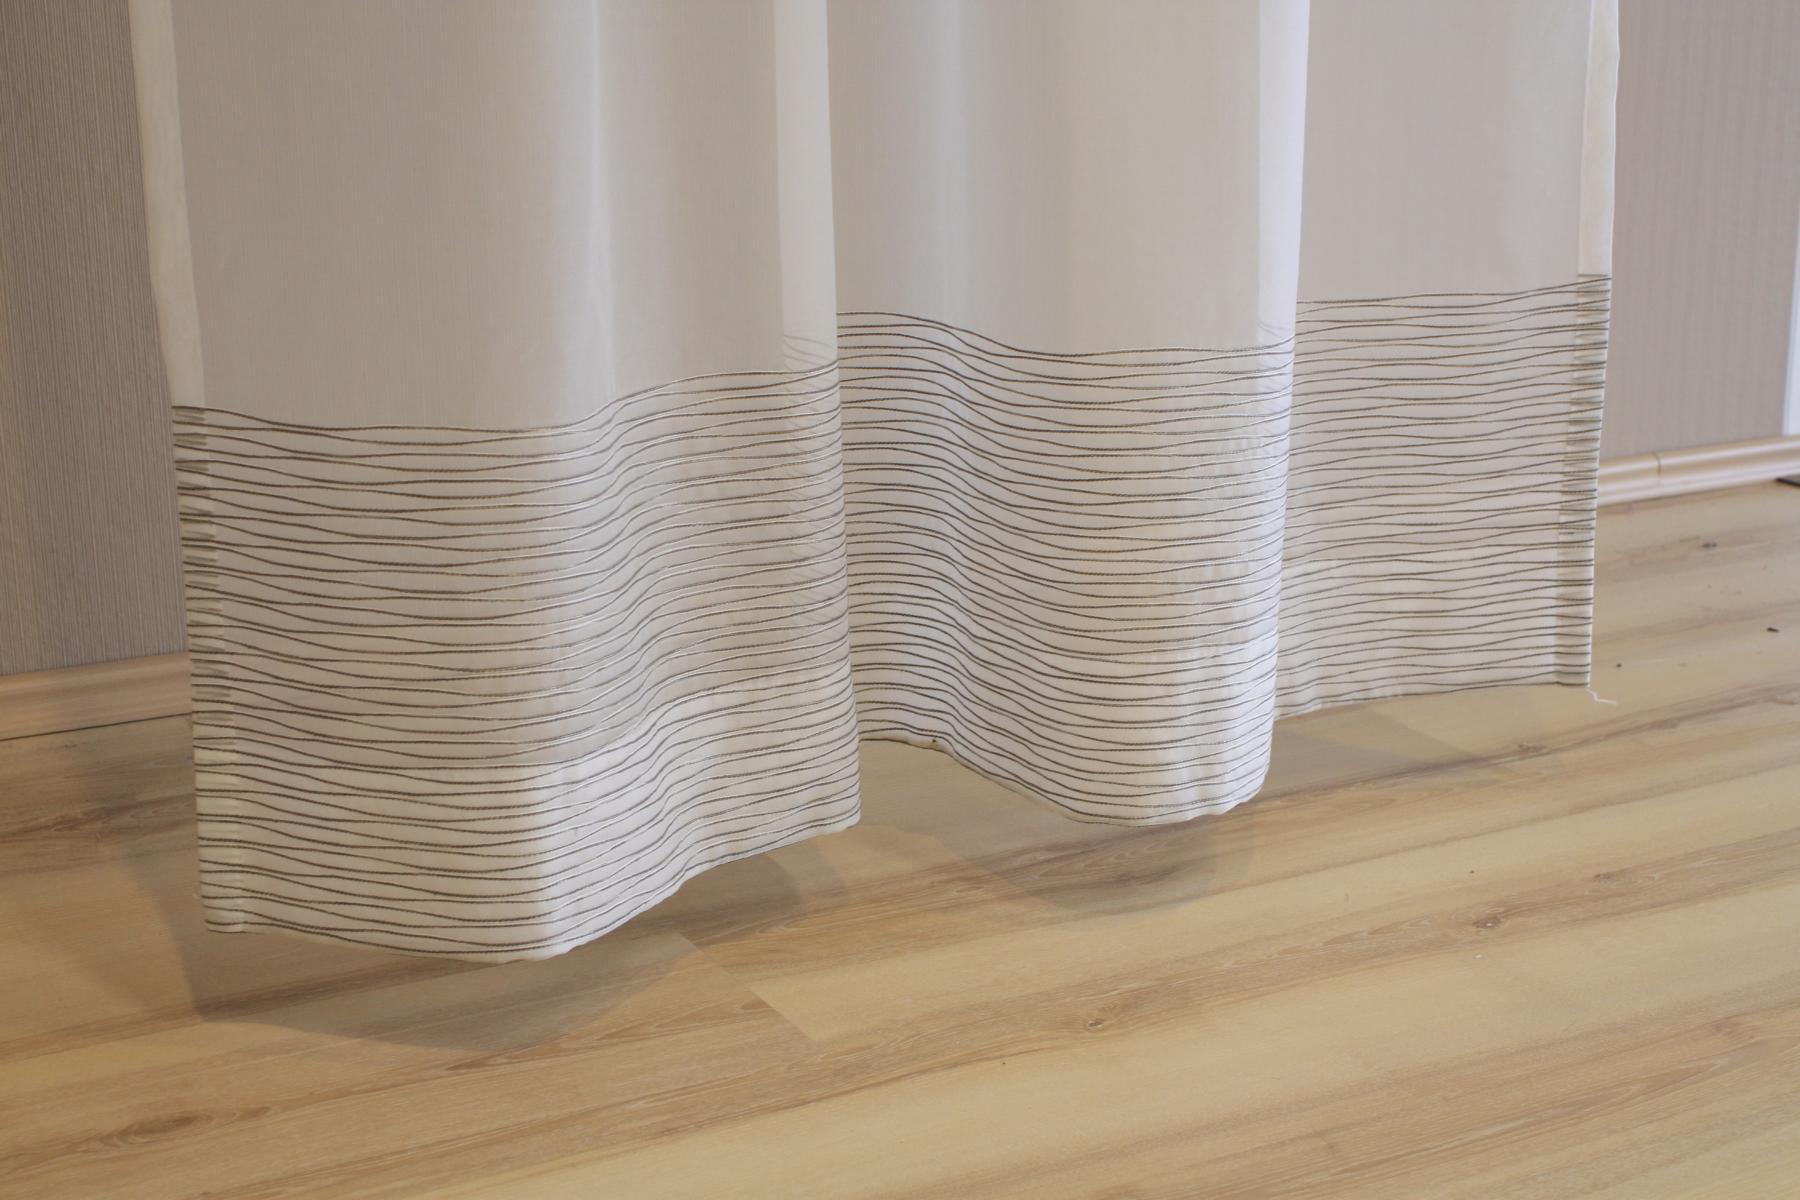 joop gardine vorhang schlaufenschal water 010 kitt 130x245 cm fertigschal. Black Bedroom Furniture Sets. Home Design Ideas